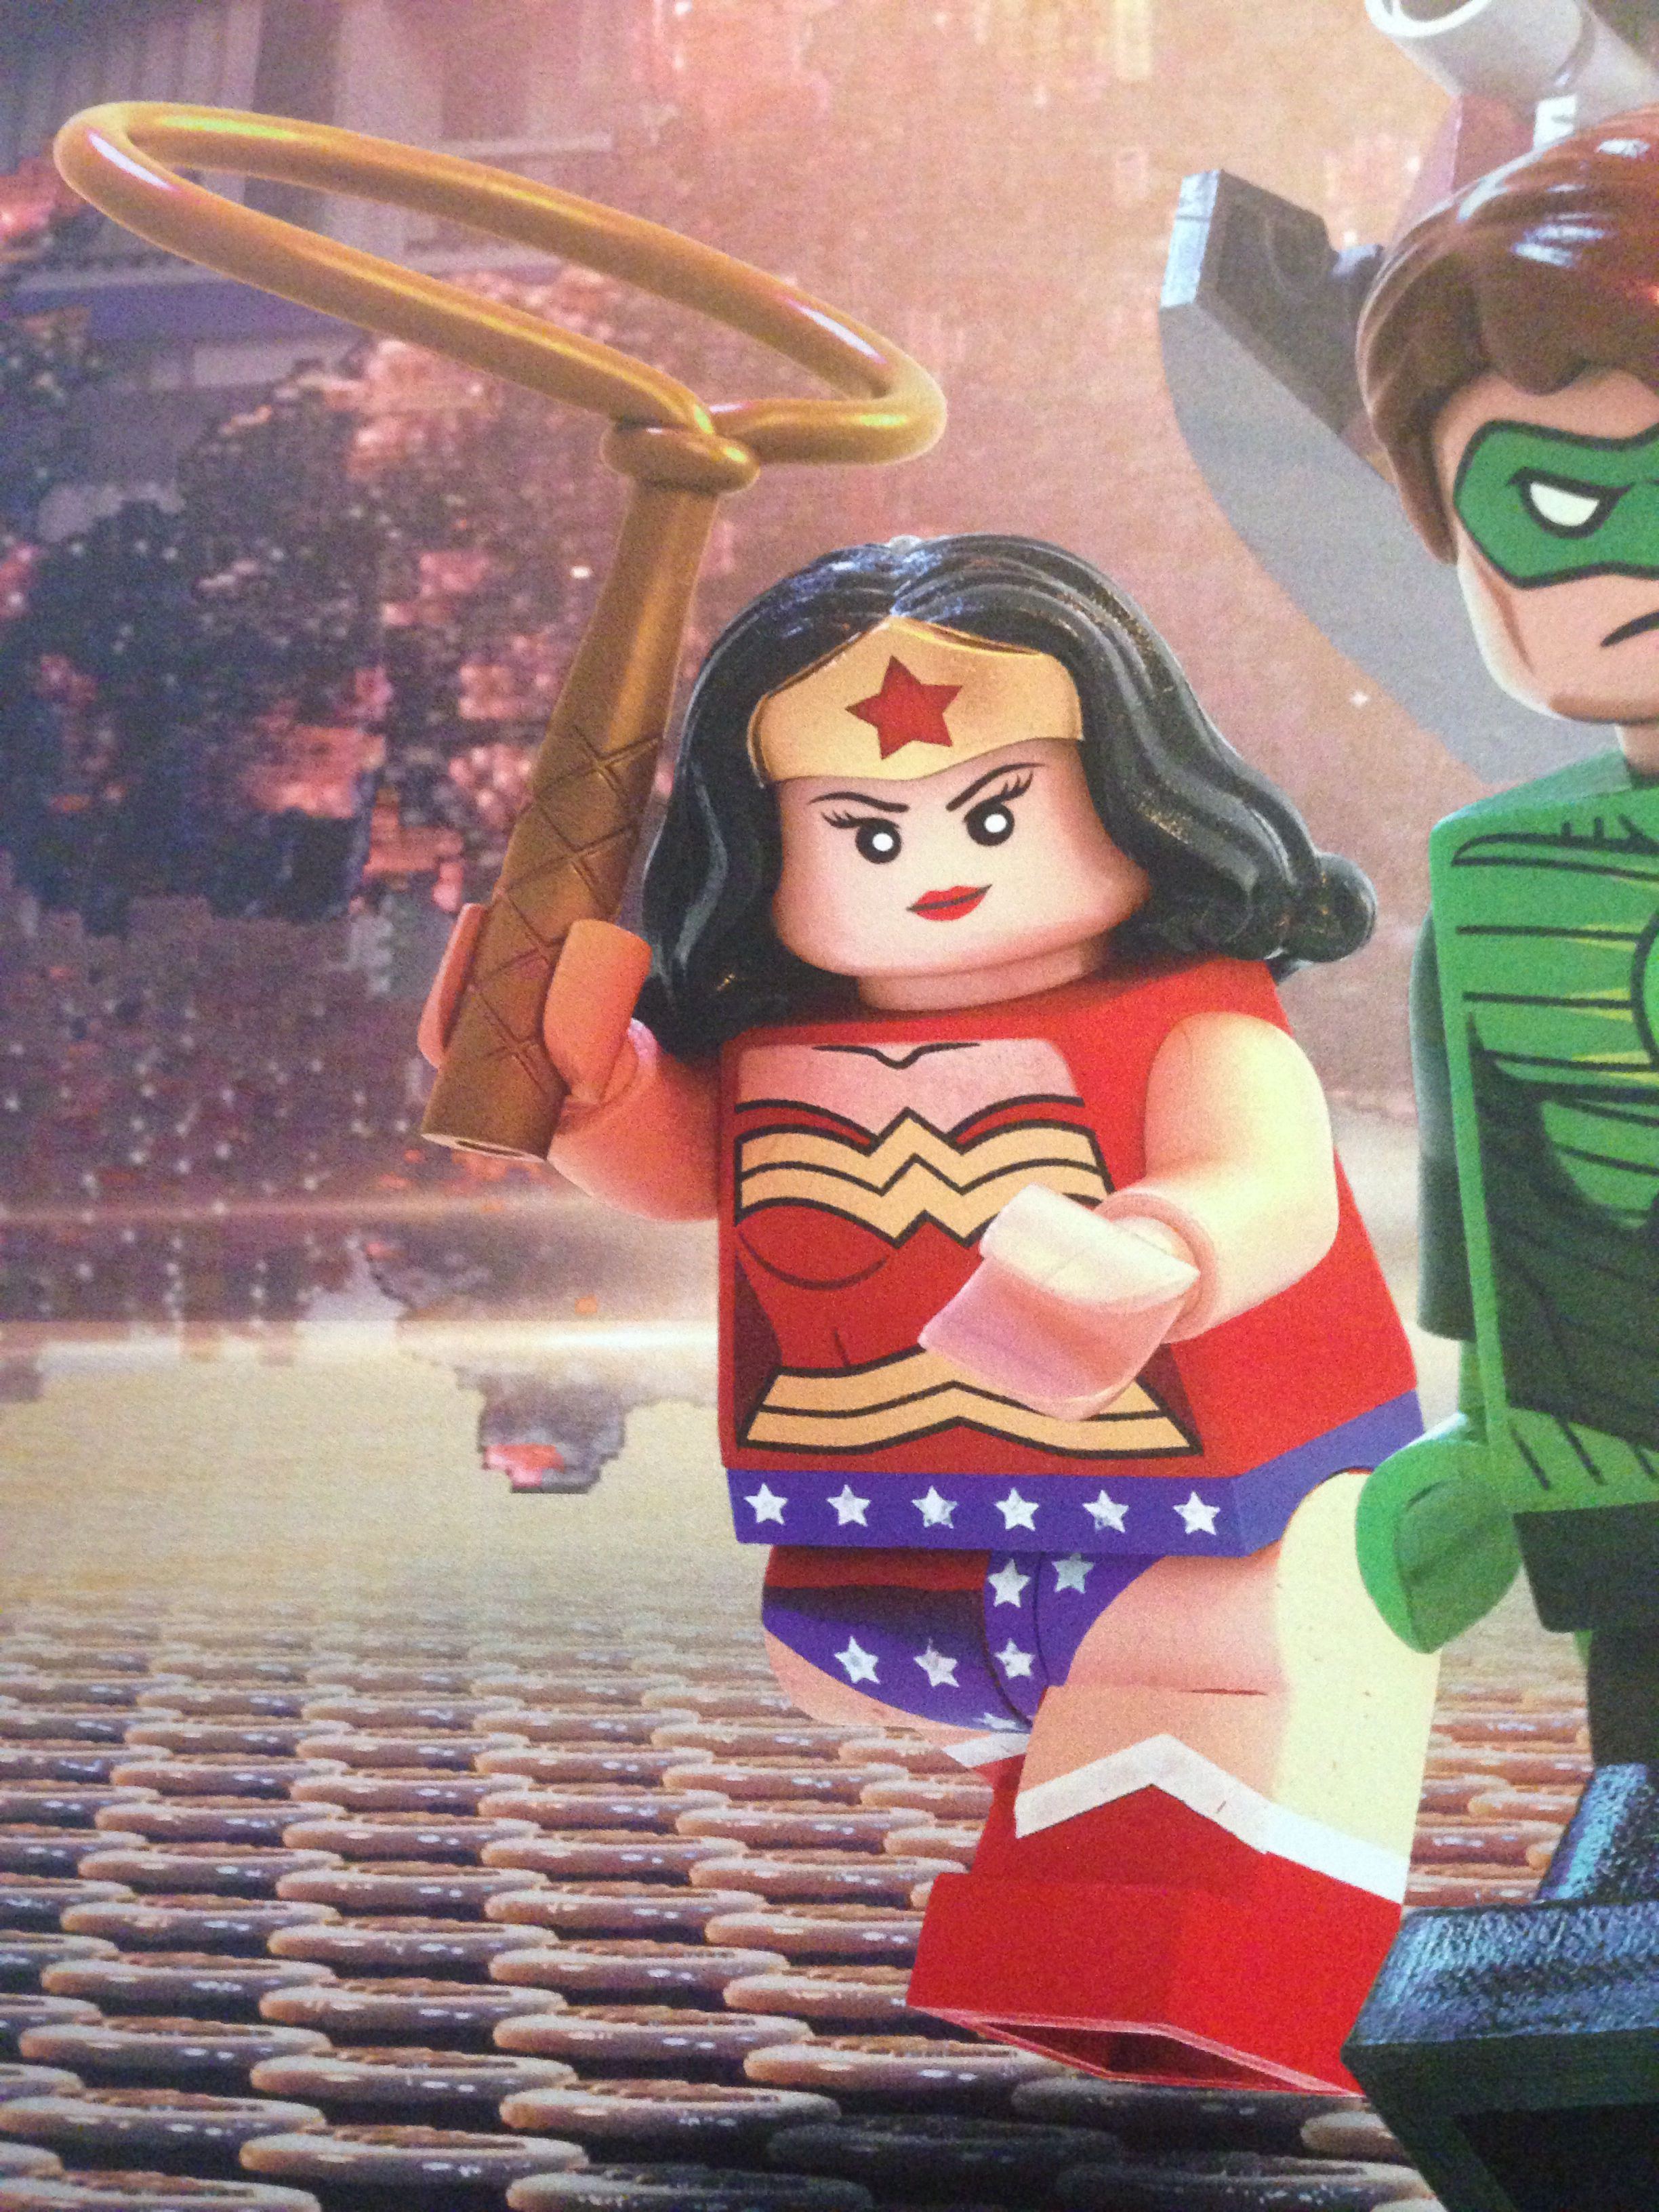 Wonder Woman in The Lego Movie | Comics | Pinterest